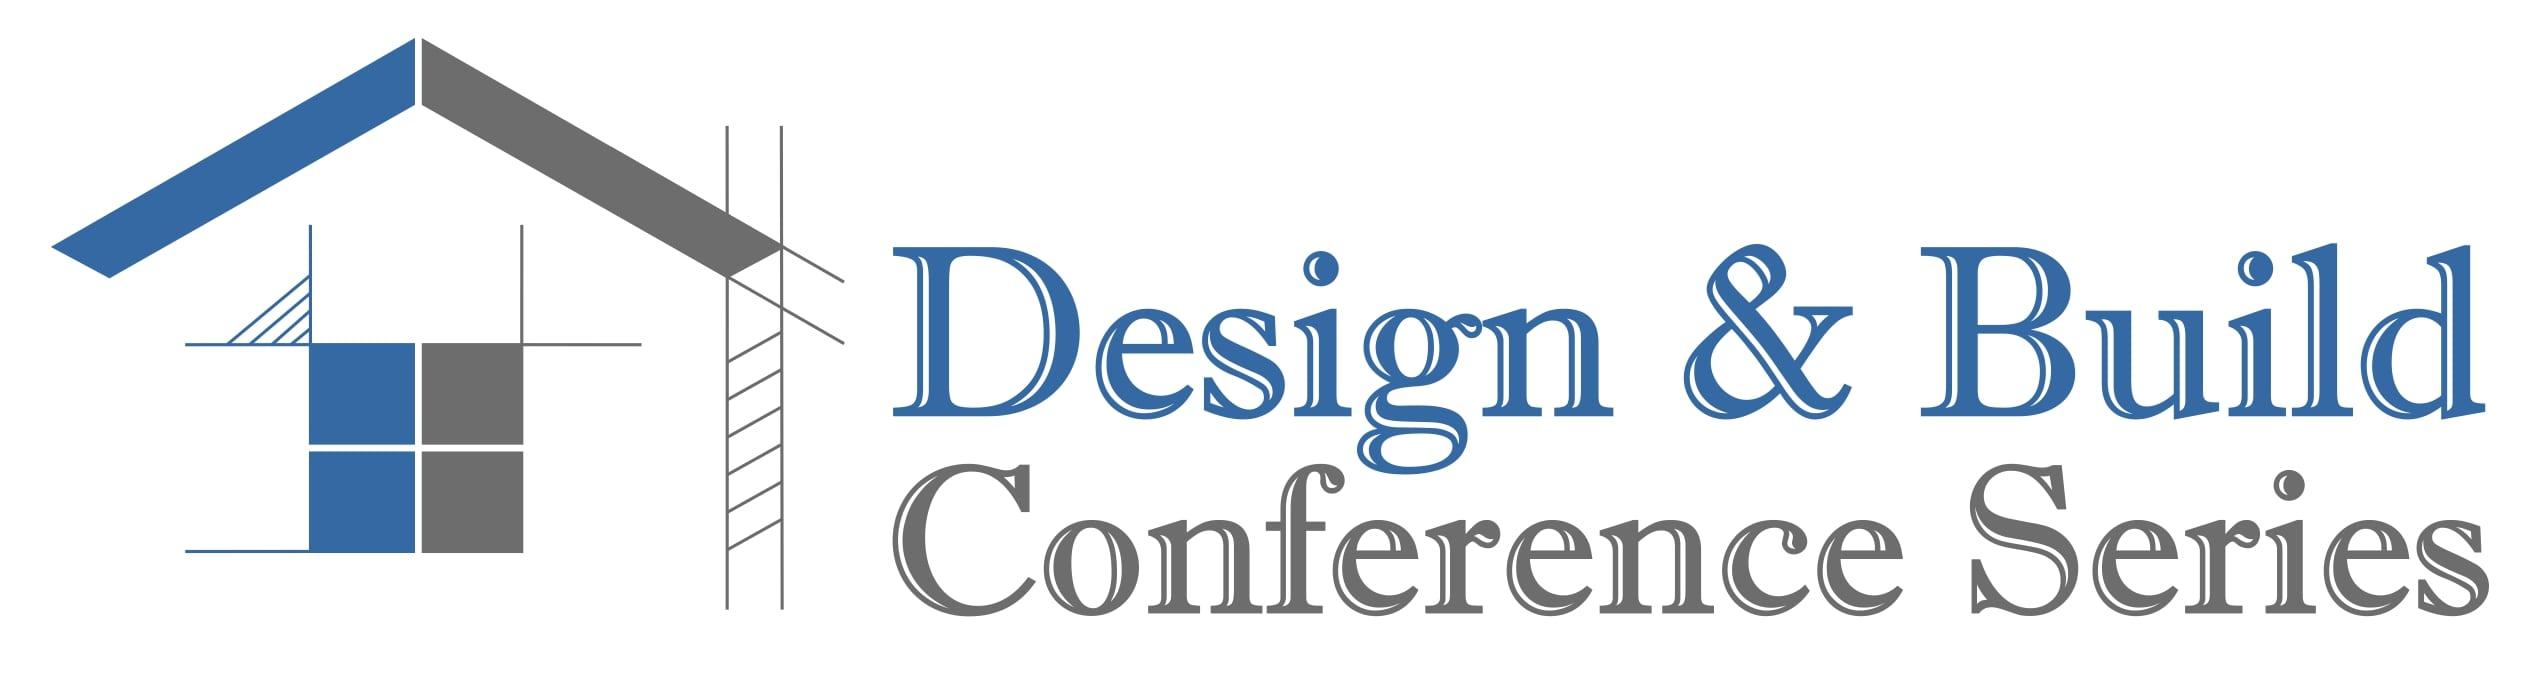 Quarterly Aibd Conferences American Institute Of Building Design